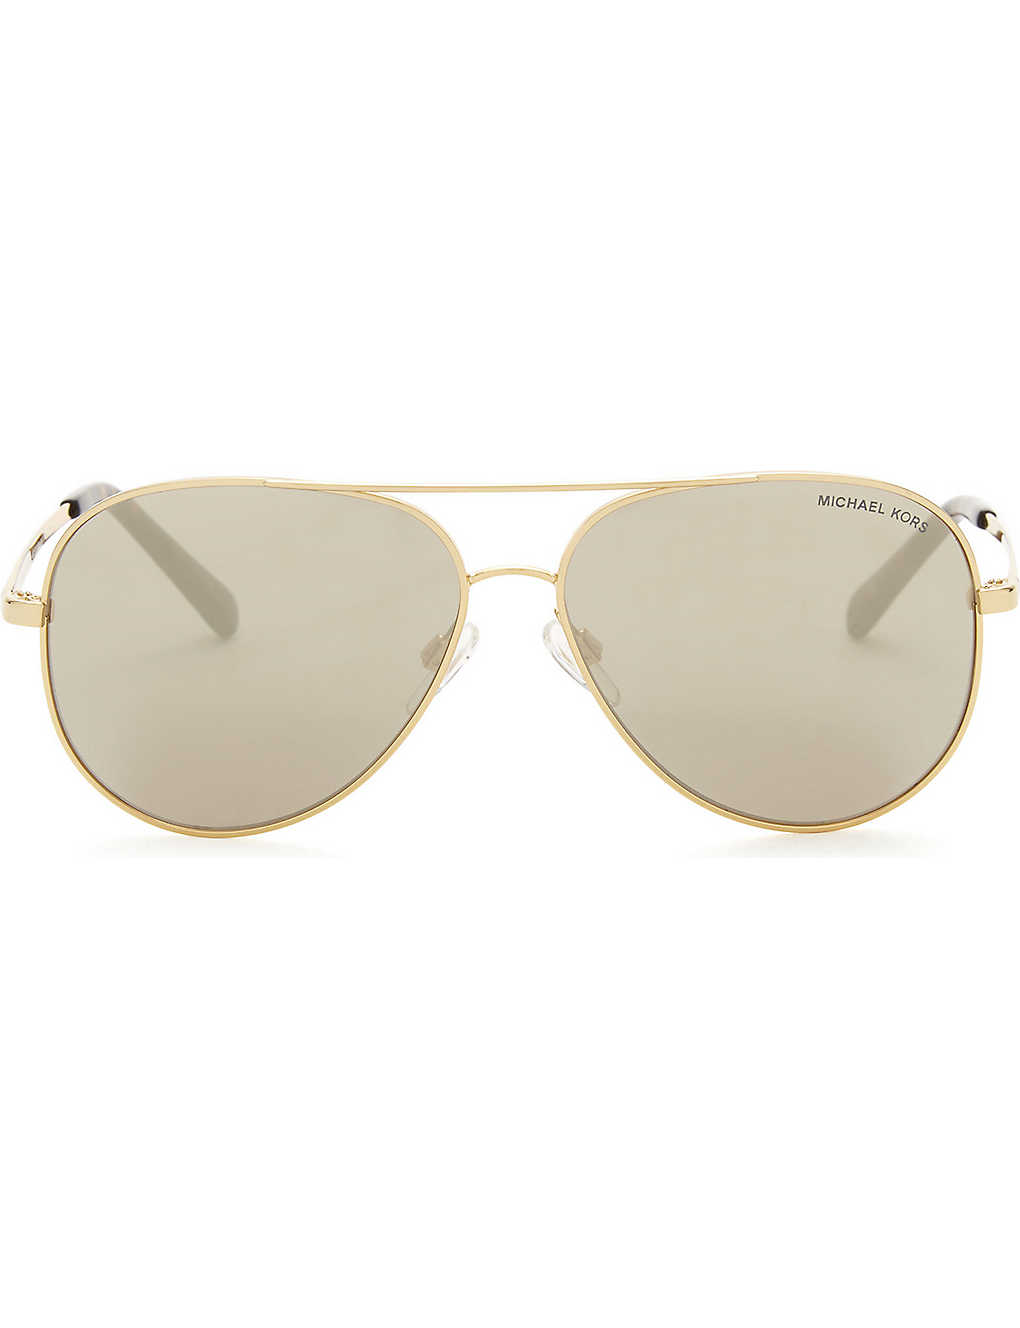 c06bb15e76200 MICHAEL KORS - Mk5016 Kendall aviator sunglasses